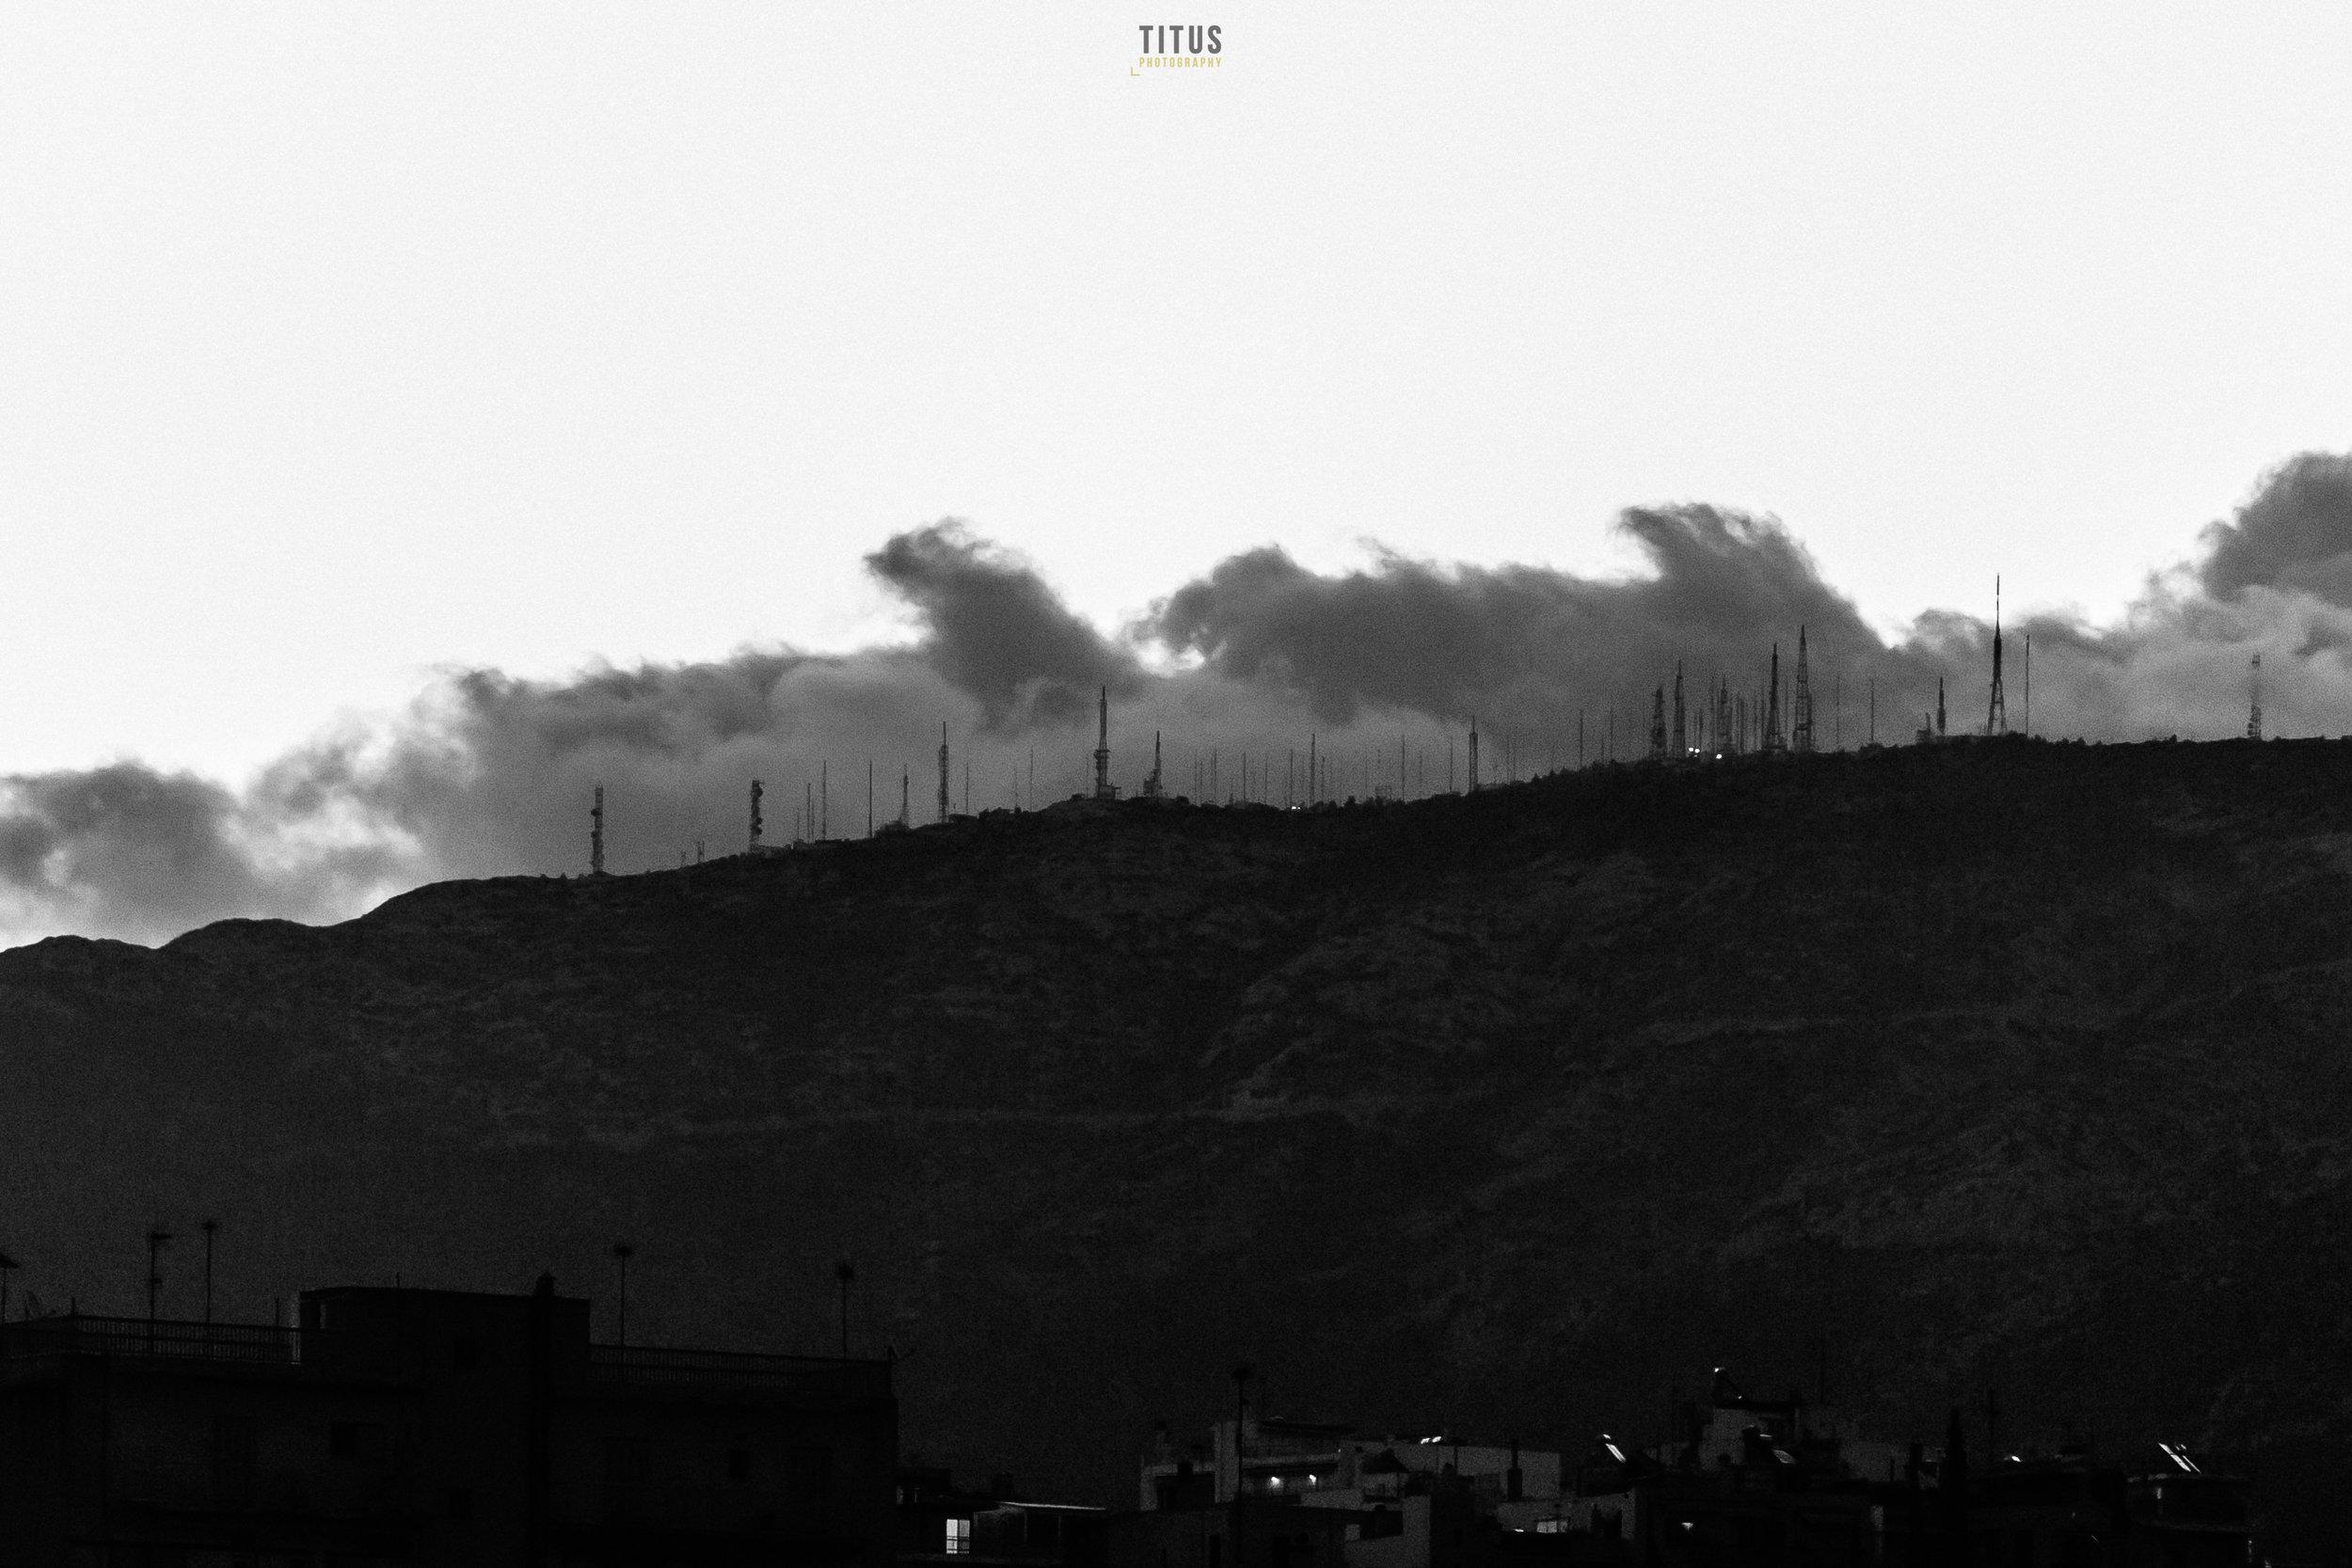 081-mons-athens-blog images.JPG